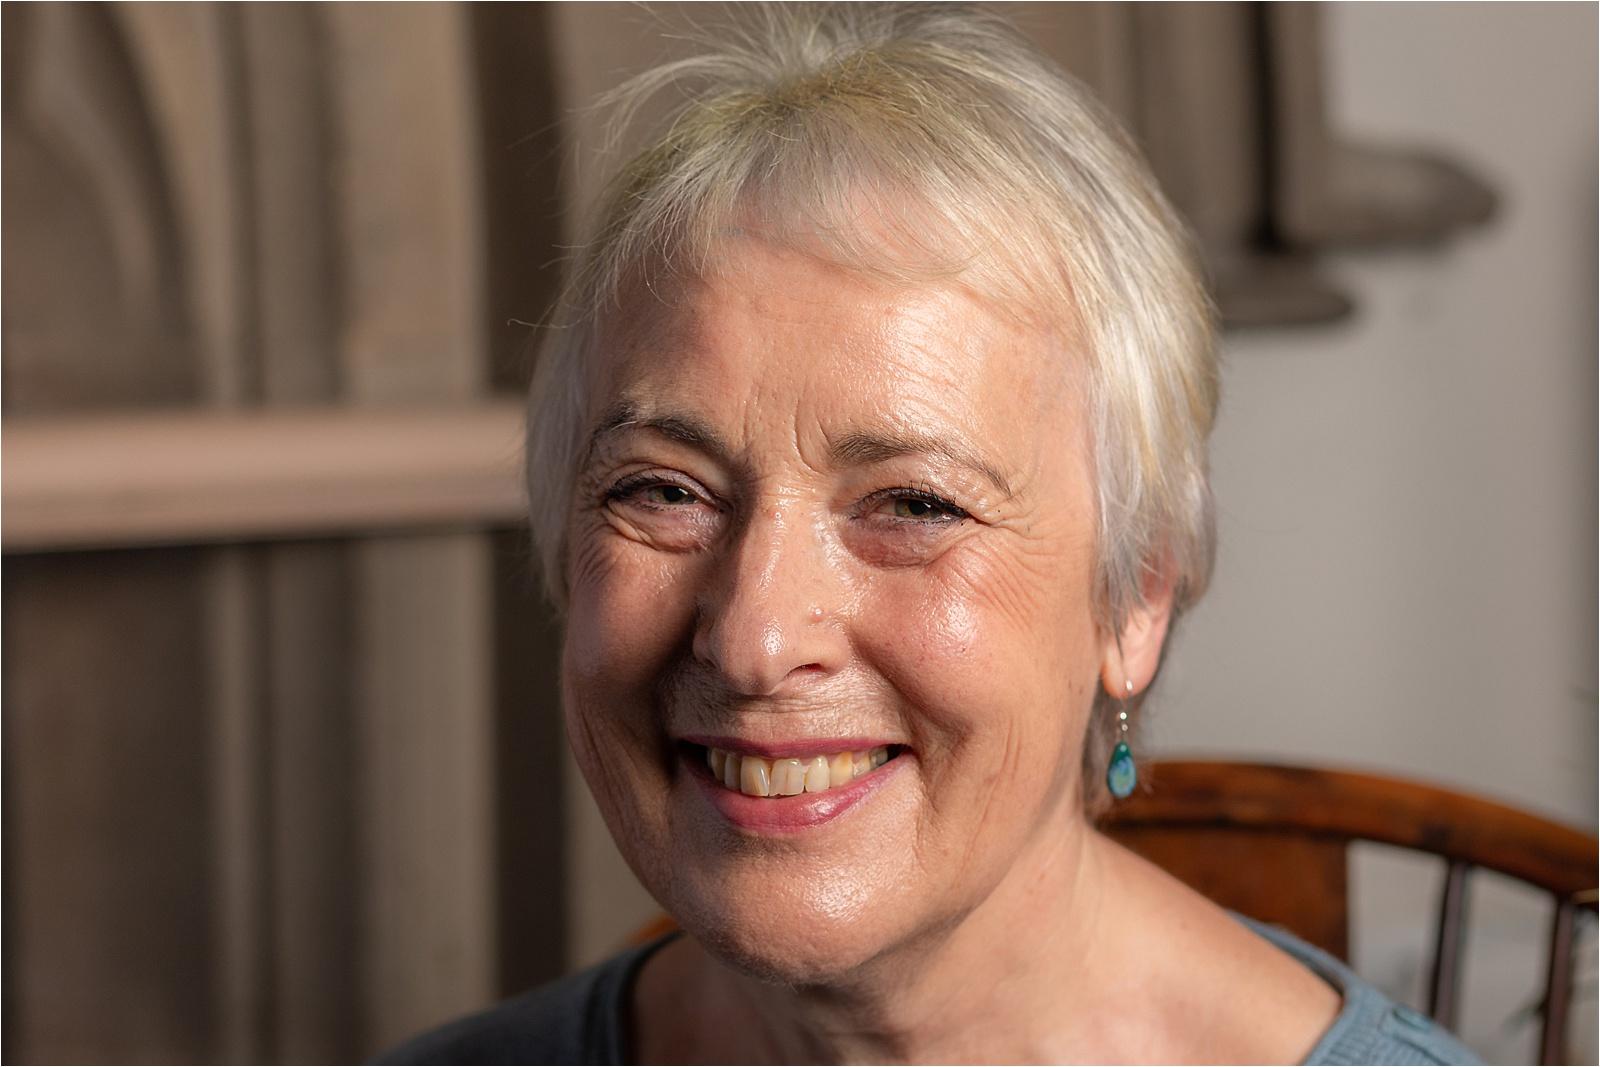 SuzanneRobinson – Accredited Counsellor